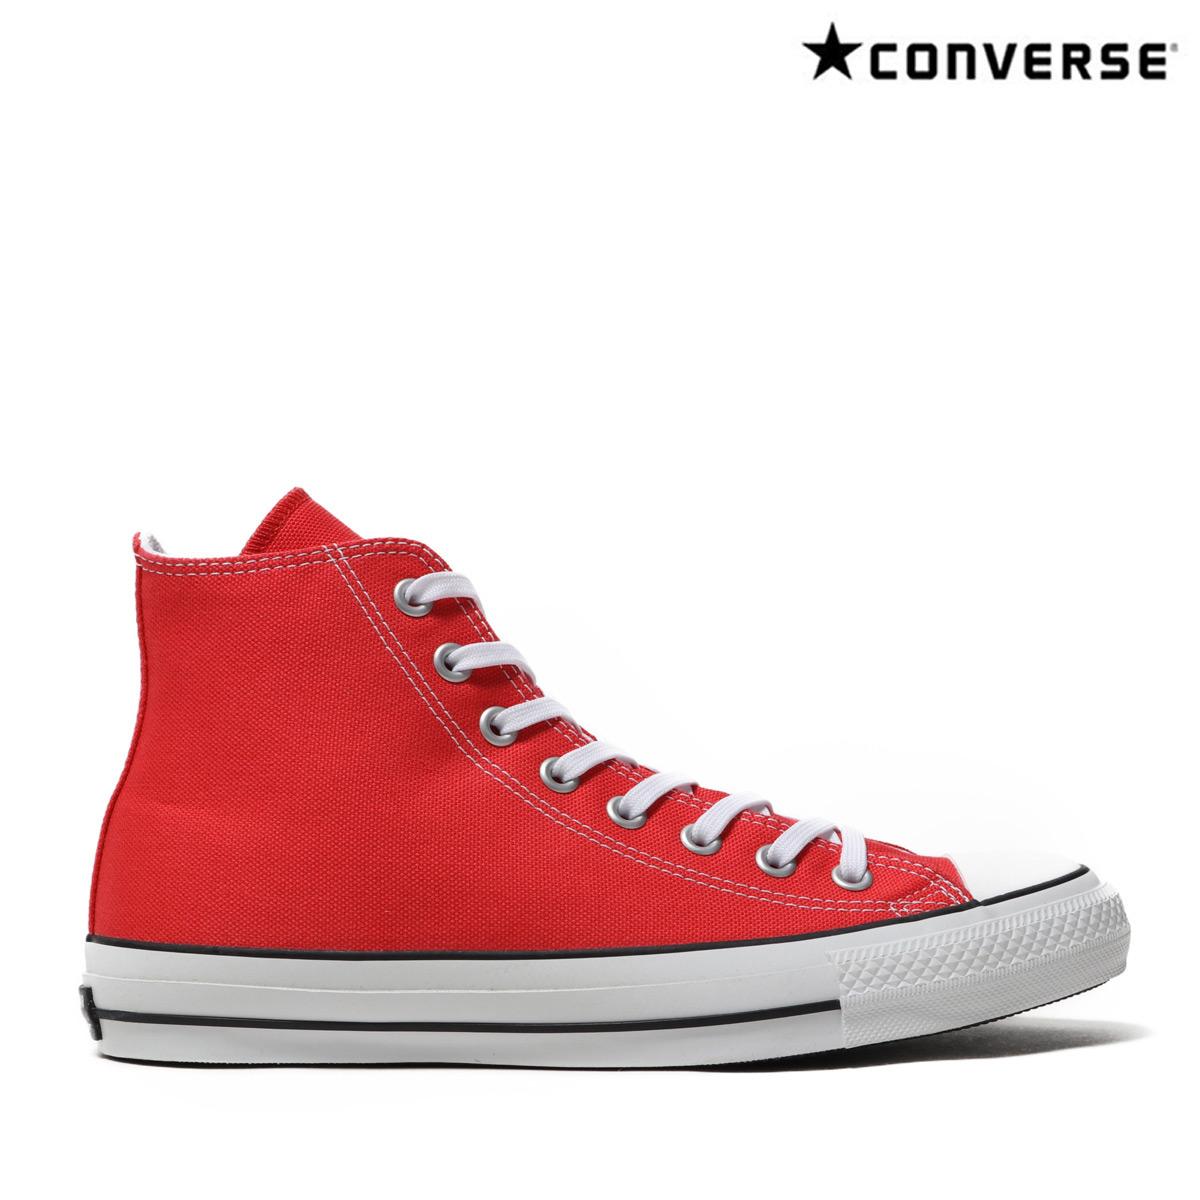 f4c5146a289a CONVERSE ALL STAR 100 HUGEPATCH HI (RED) (Converse all-stars 100 Hugh  dipatch high)